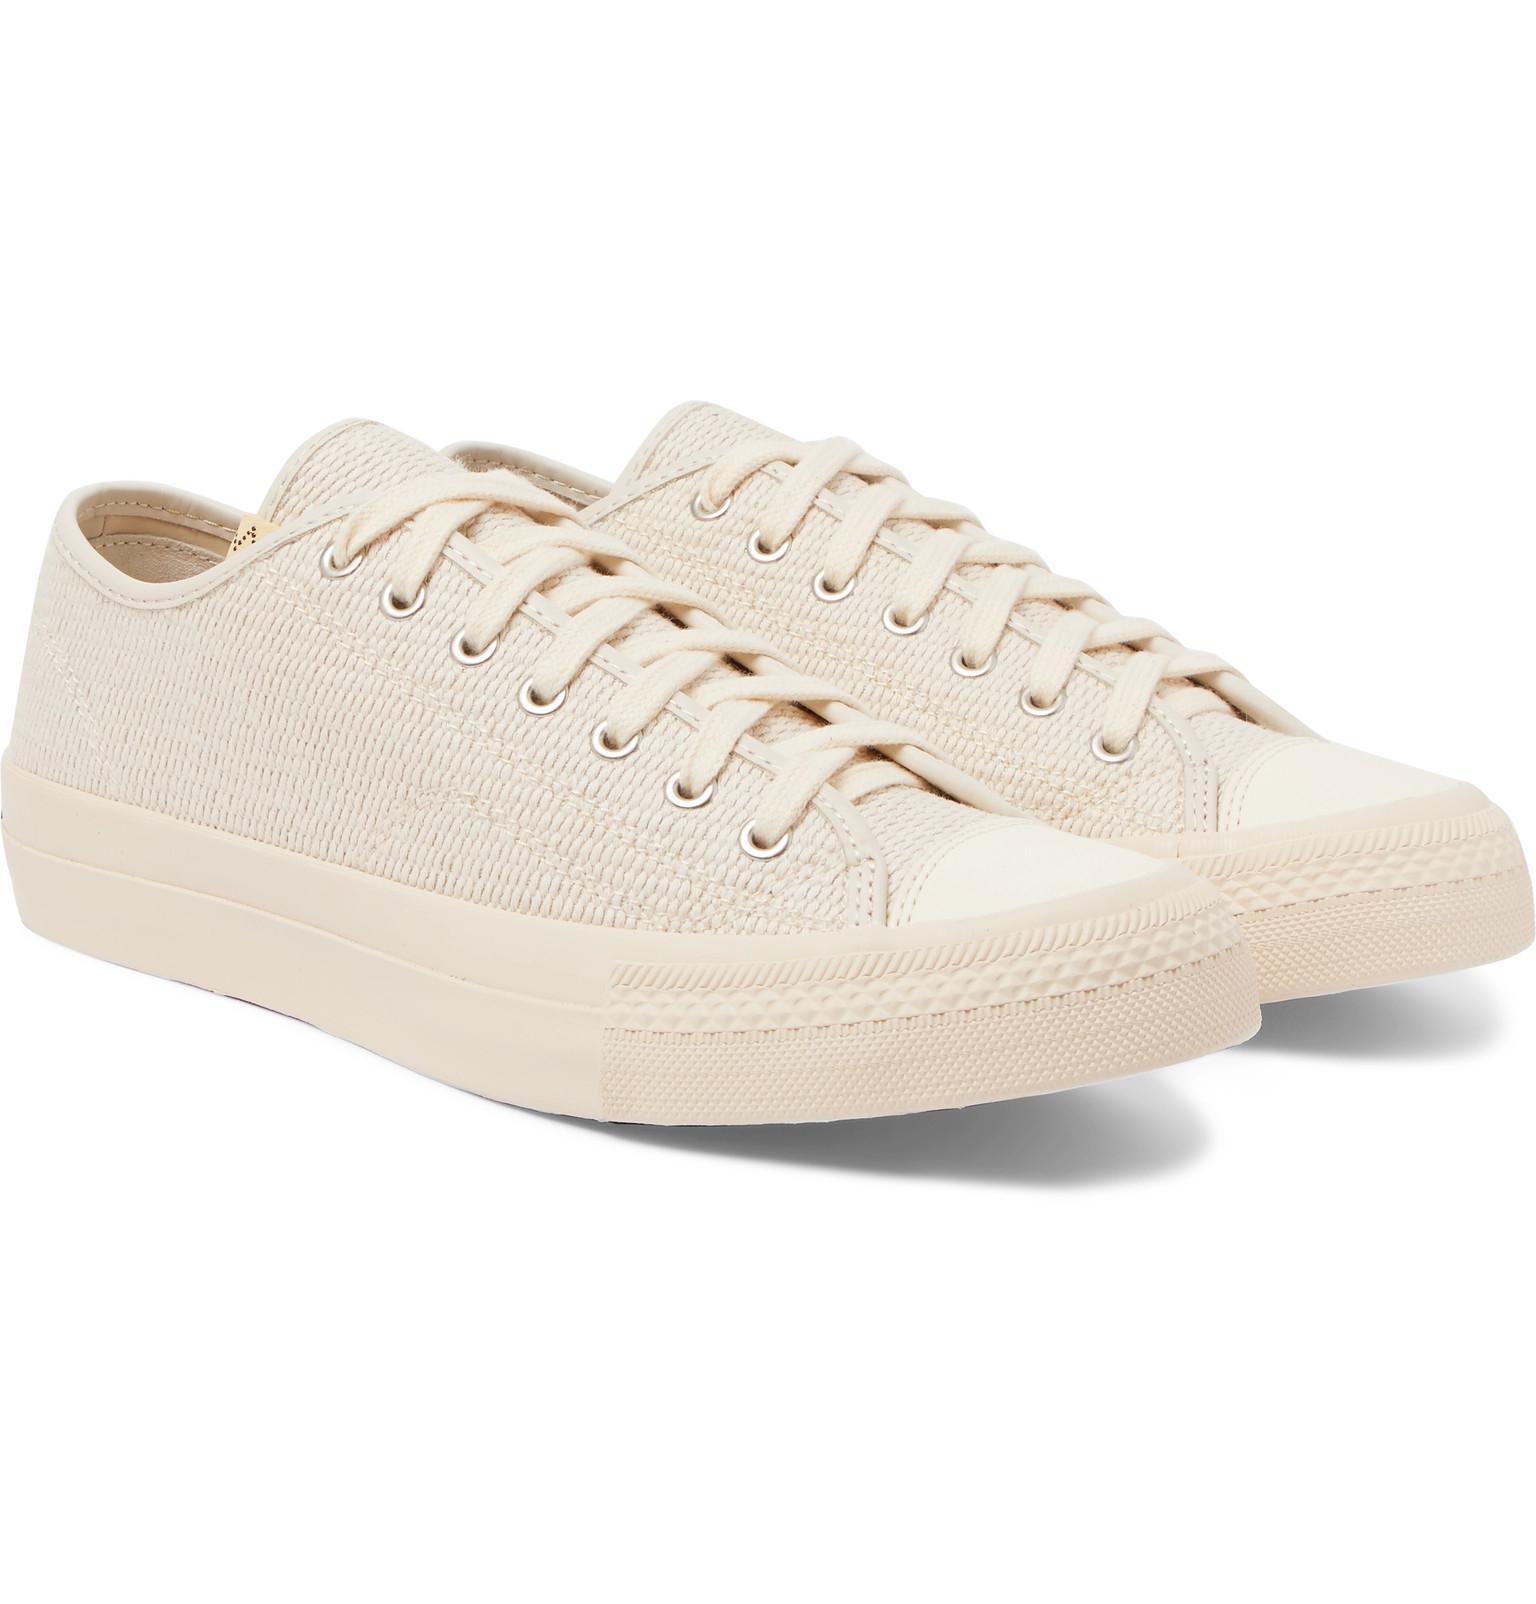 VISVIMSkagway Lo Dogi Sneakers cDFNTLQ7